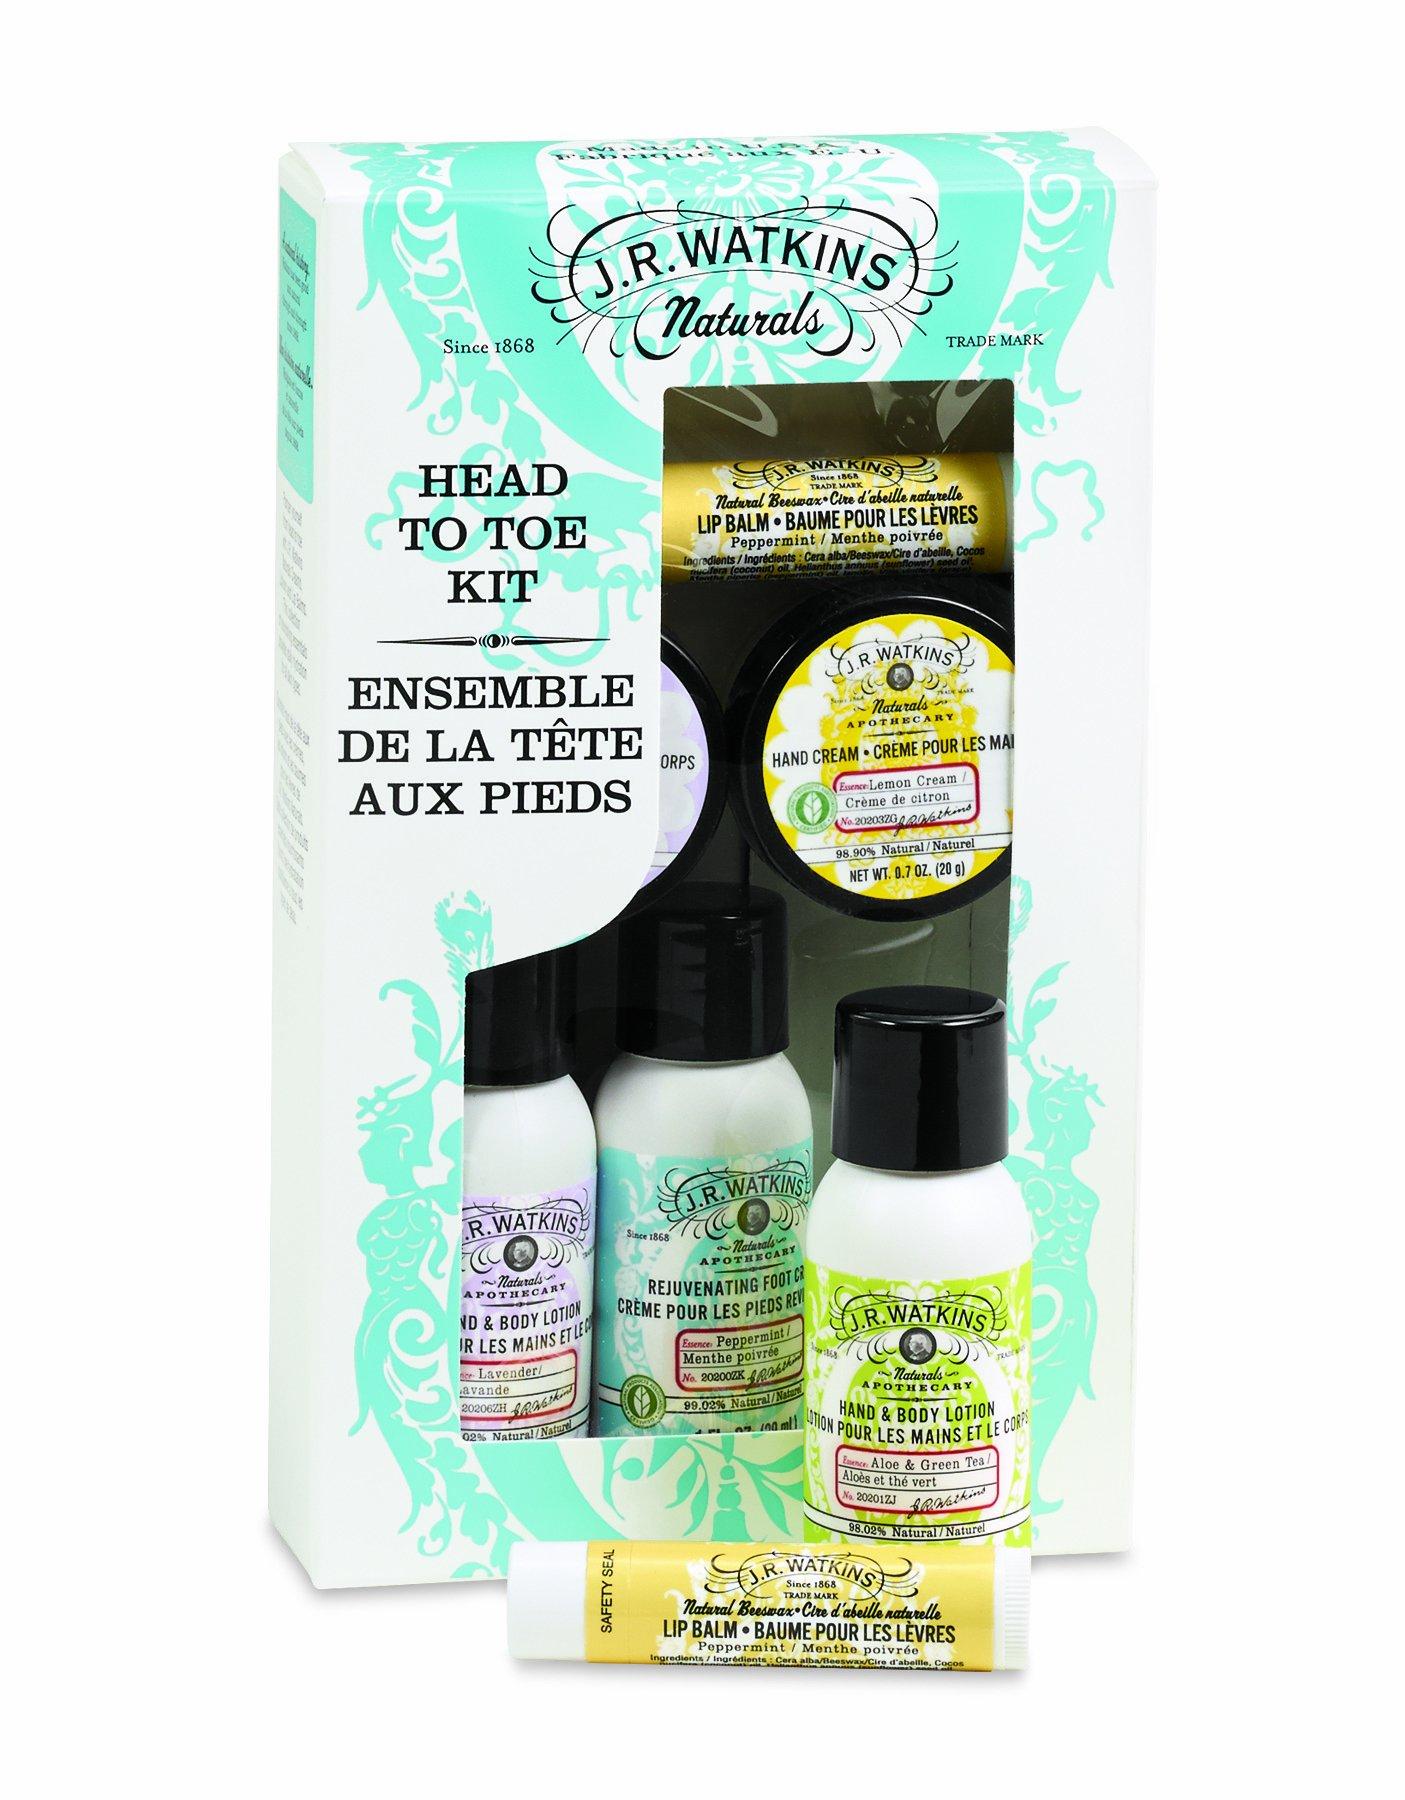 J.R. Watkins Skin Care Gift Set, Head To Toe, Hand Cream/Hand & Body Lotion/Foot Cream/Lip Balm